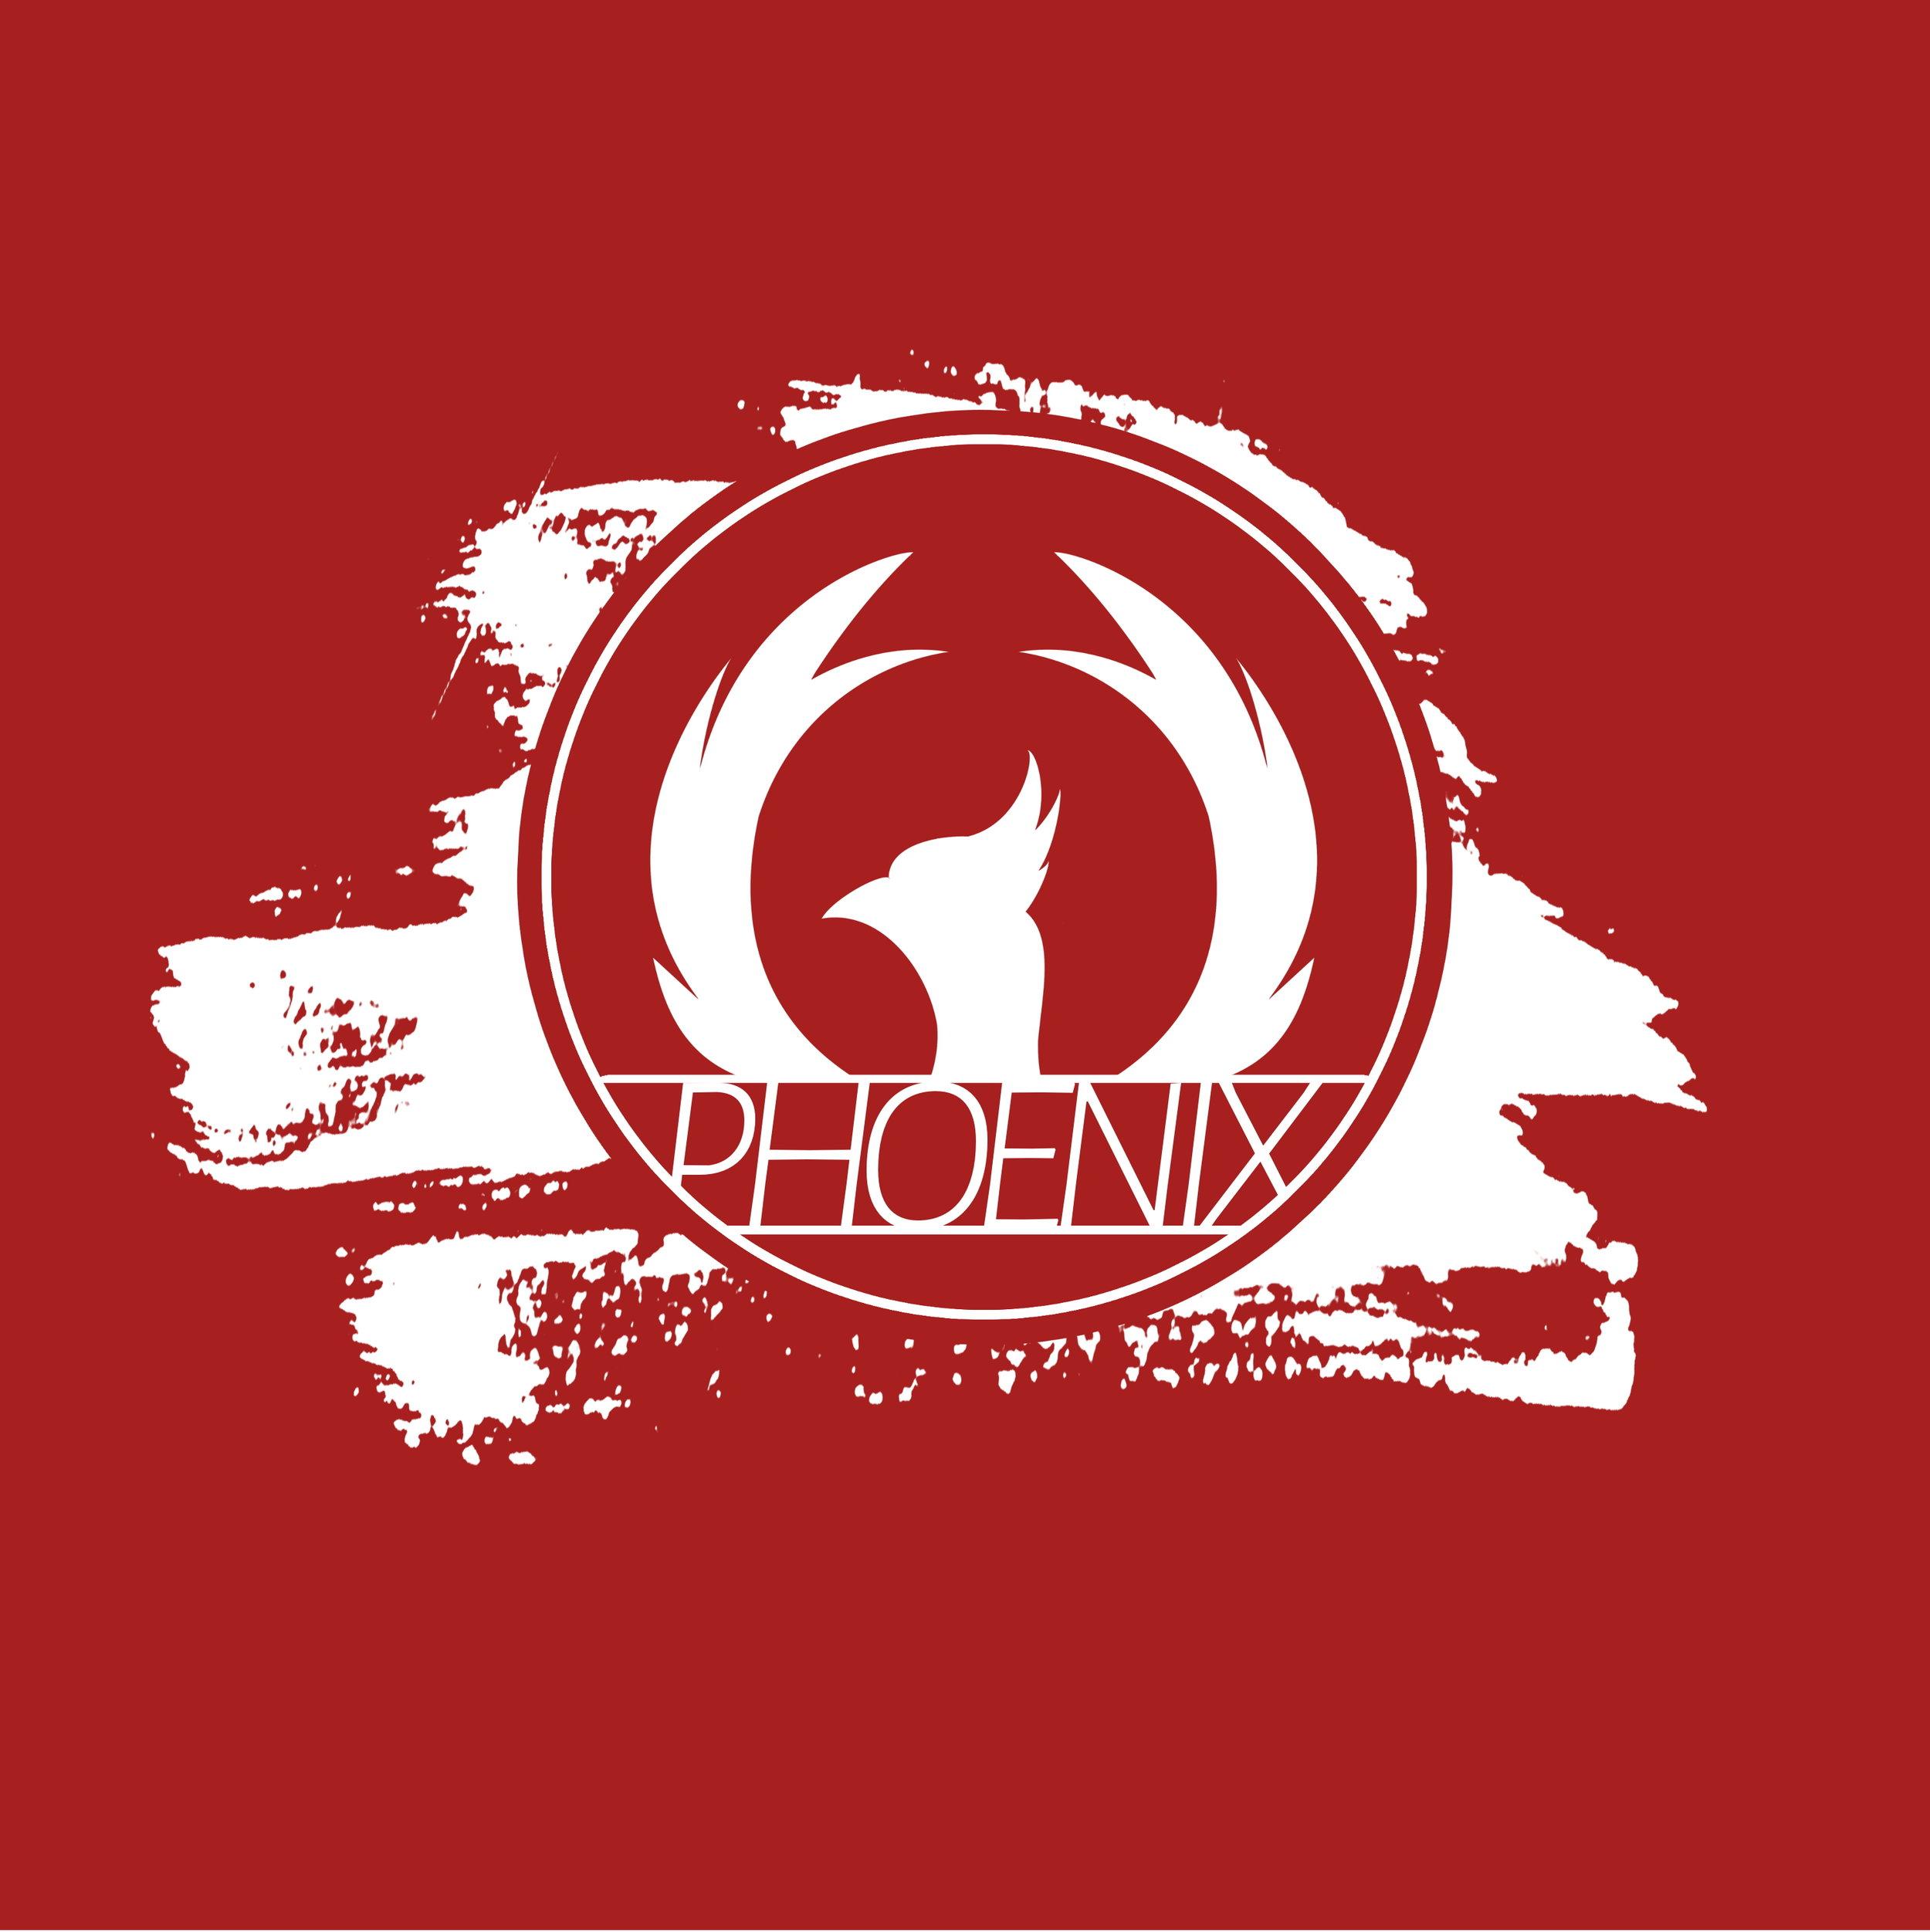 PhoenixLogo(DarkBack).jpg